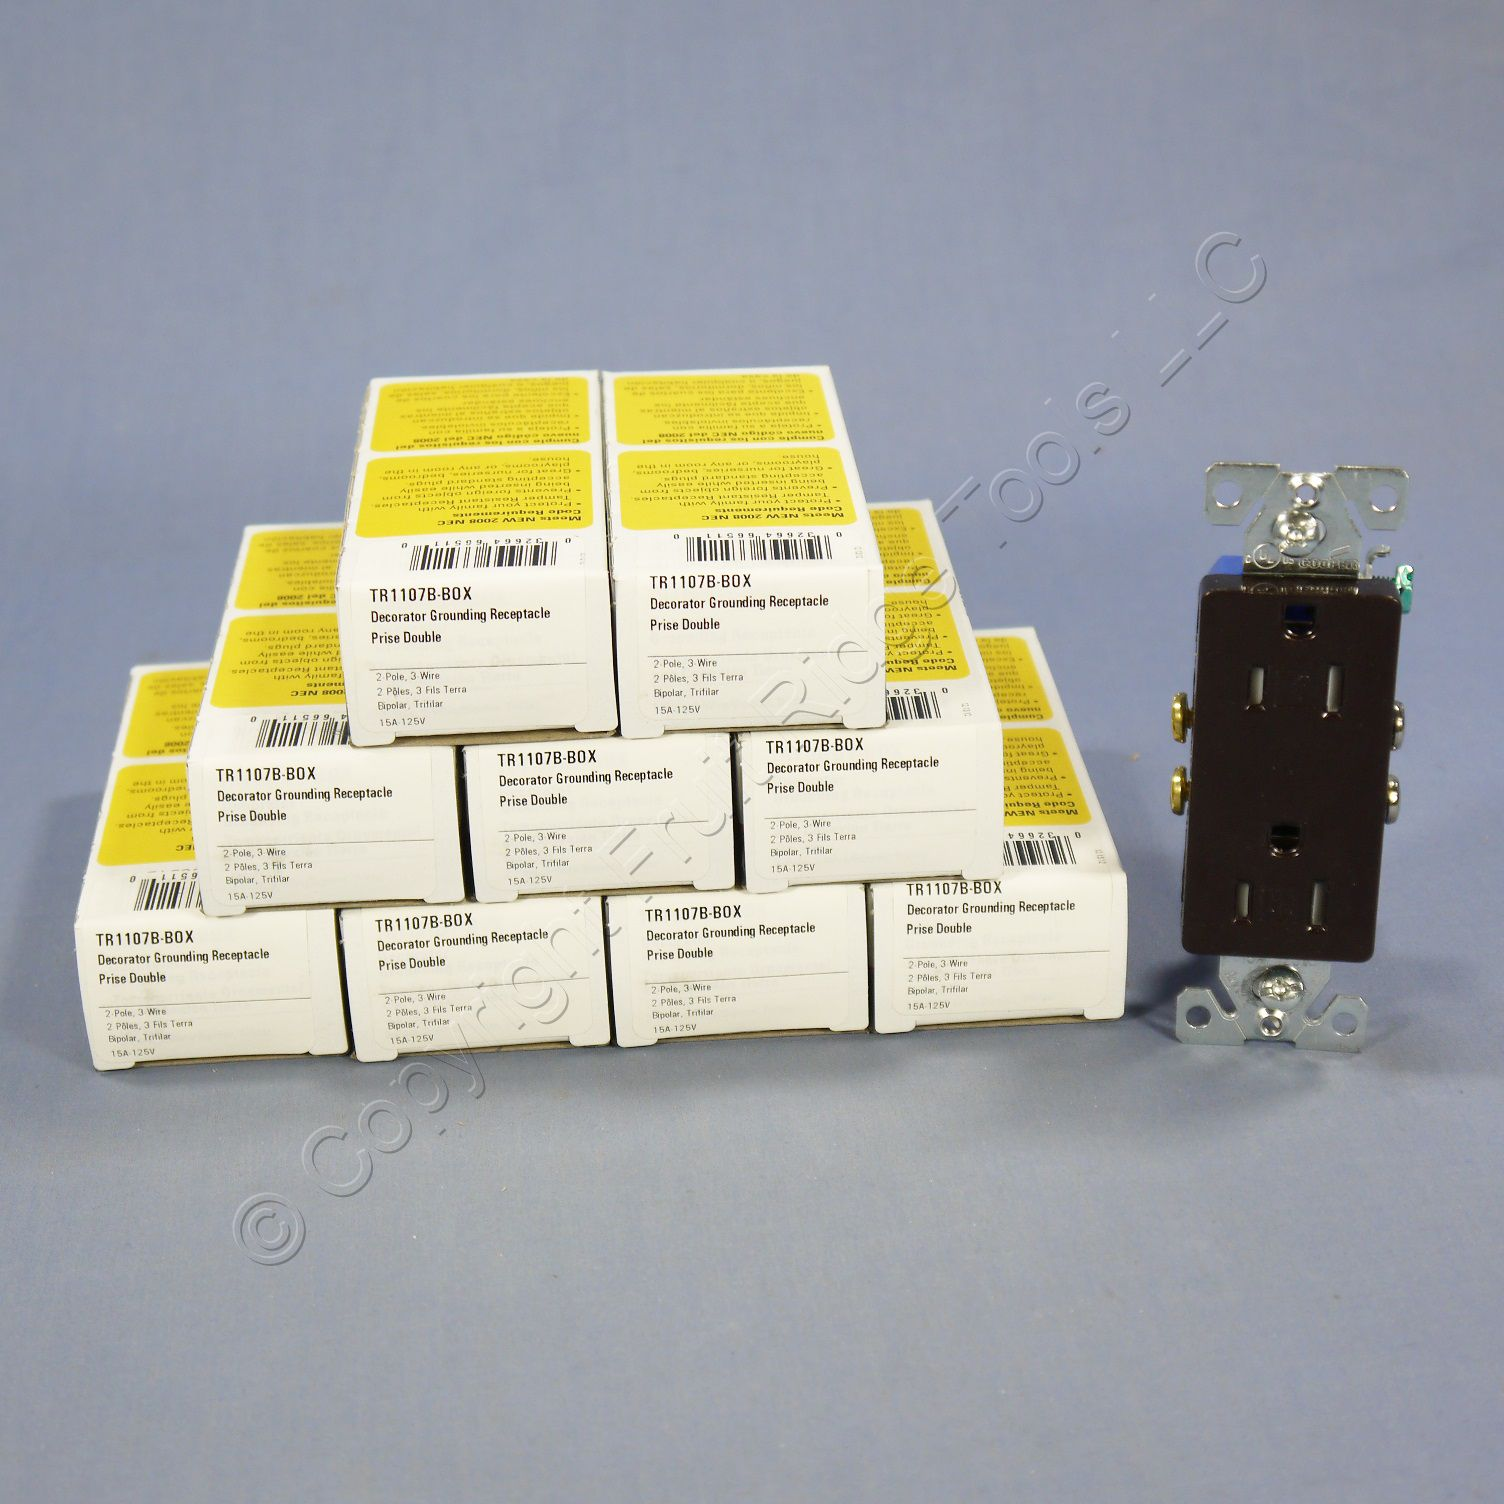 10 Cooper Brown TAMPER RESISTANT Decorator Receptacle Outlets NEMA 5-15 15A TR1107B